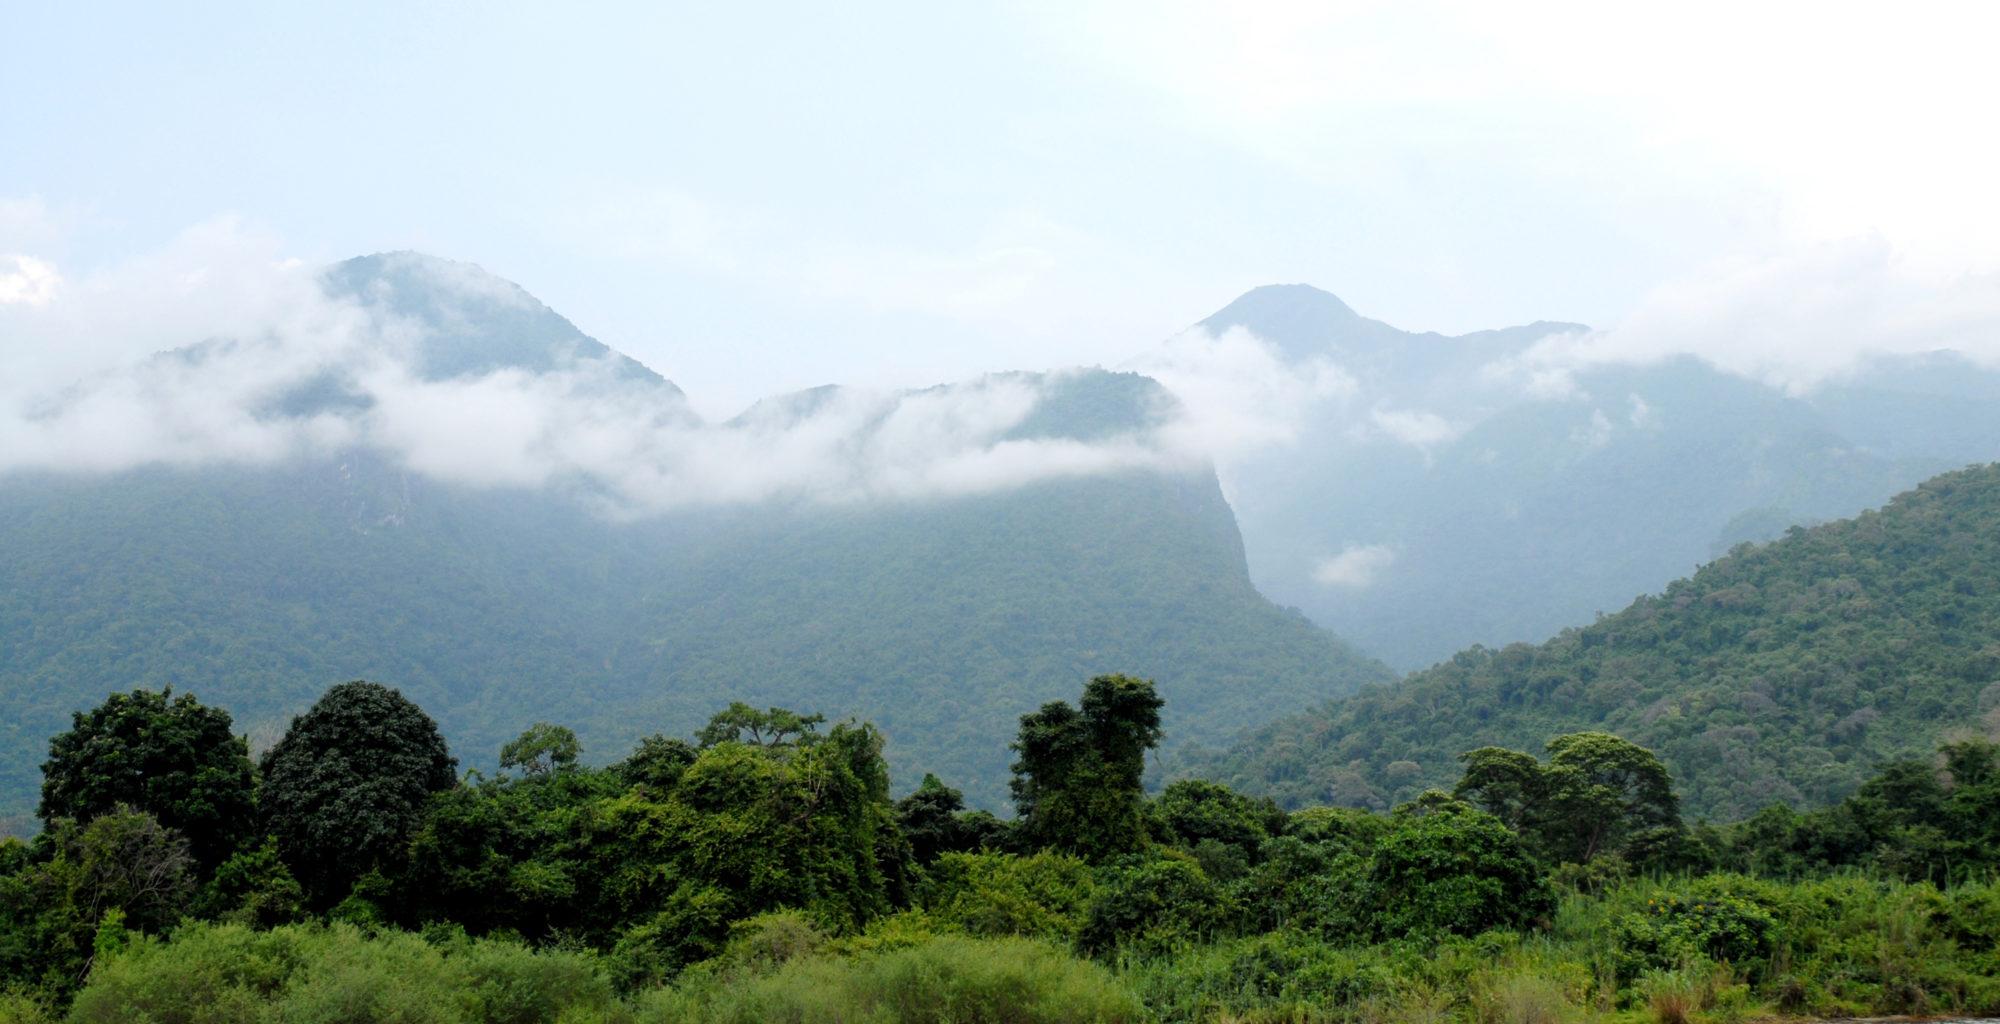 Tanzania-Chimp-Nest-Landscape